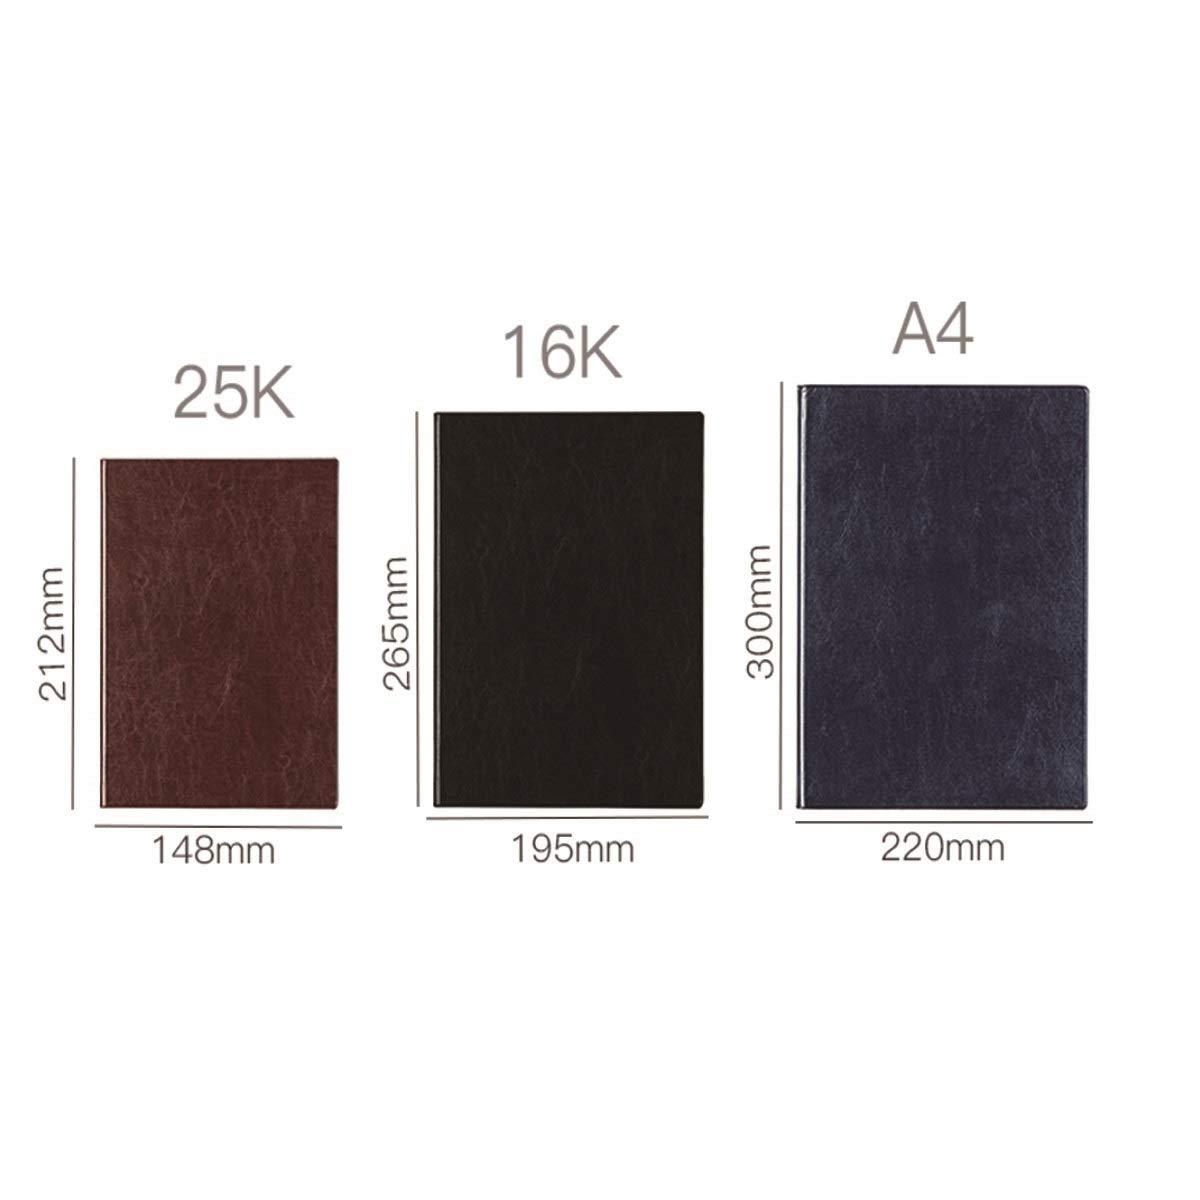 notebook business in pelle forniture per ufficio Color : Blue, Size : 16K grande libro A4 cancelleria per notebook SHENGSHIHUIZHONG Taccuino